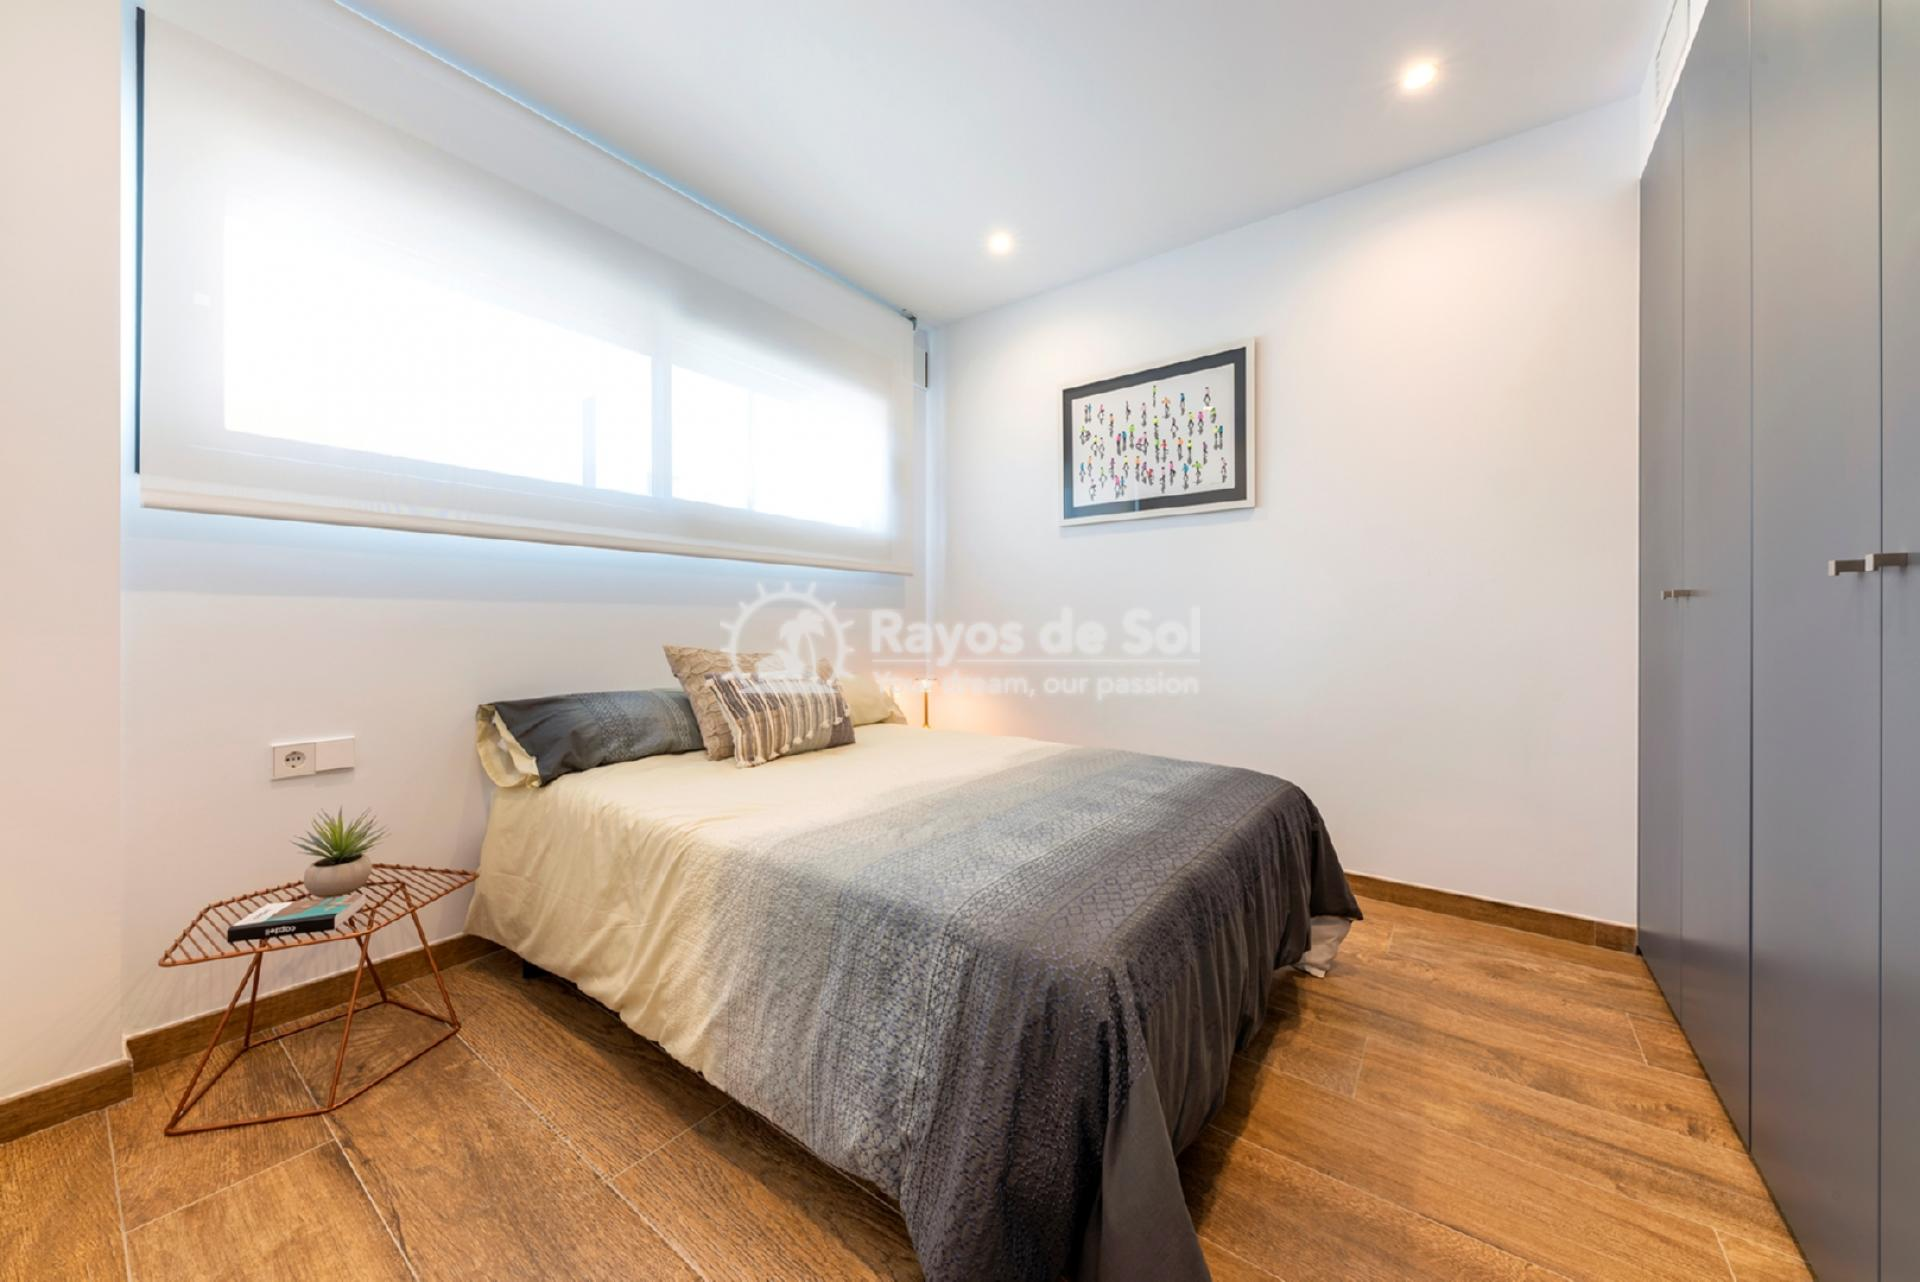 Apartment in Cumbre del Sol, Benitachell, Costa Blanca (ov-ph003) - 10